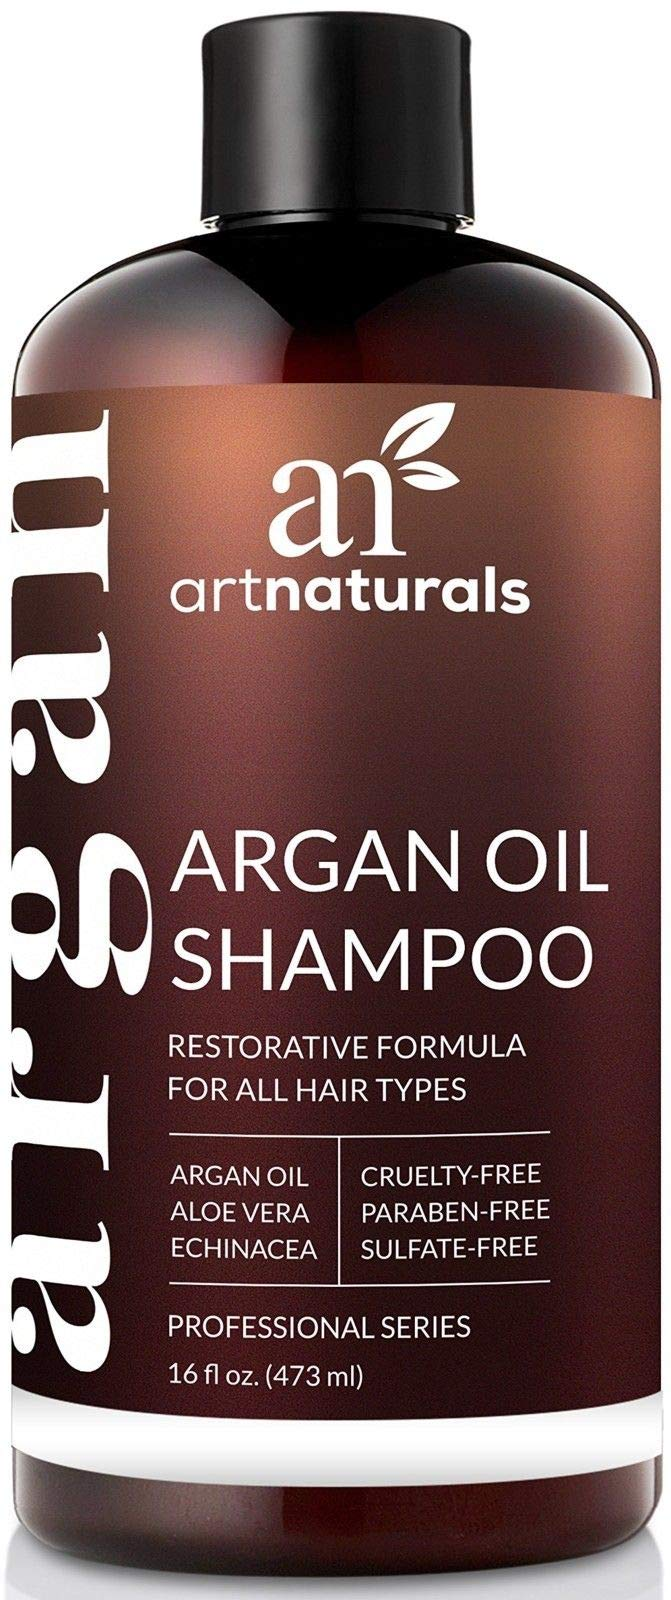 Art Naturals, Champú (aceite de aguacate) - 473 ml. product image